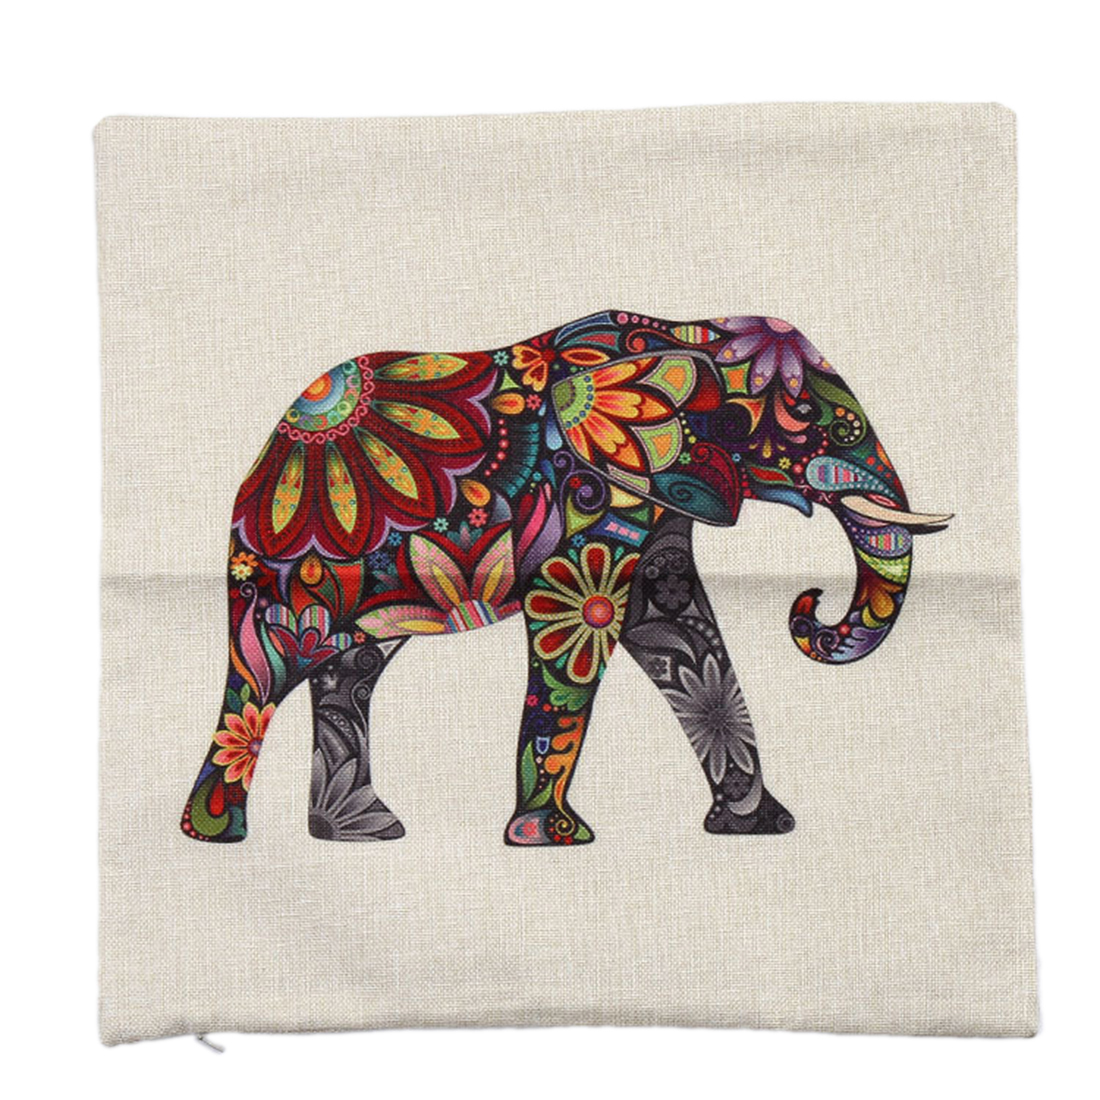 Piccocasa Home Decor Elephant Pattern Zipper Closure Cushion Pillow Cover Case